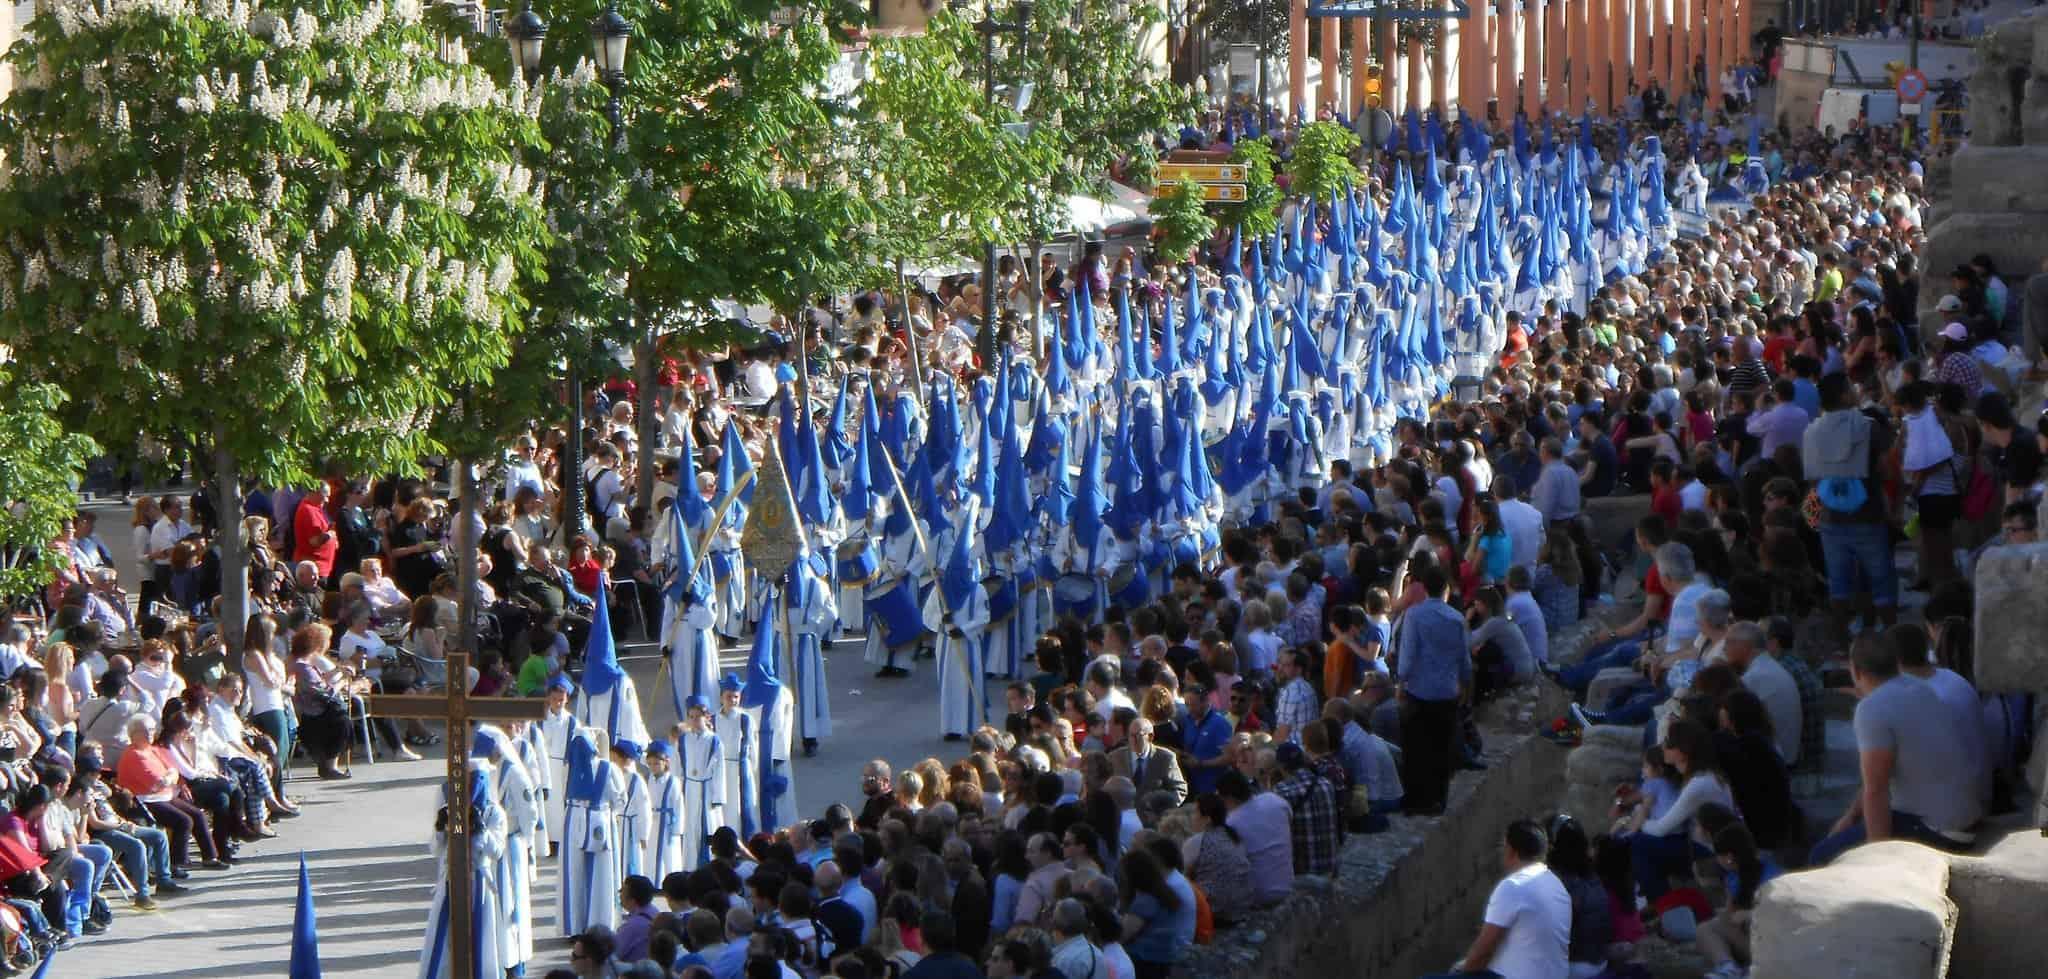 Semana Santa en Zaragoza: fiesta de referencia nacional